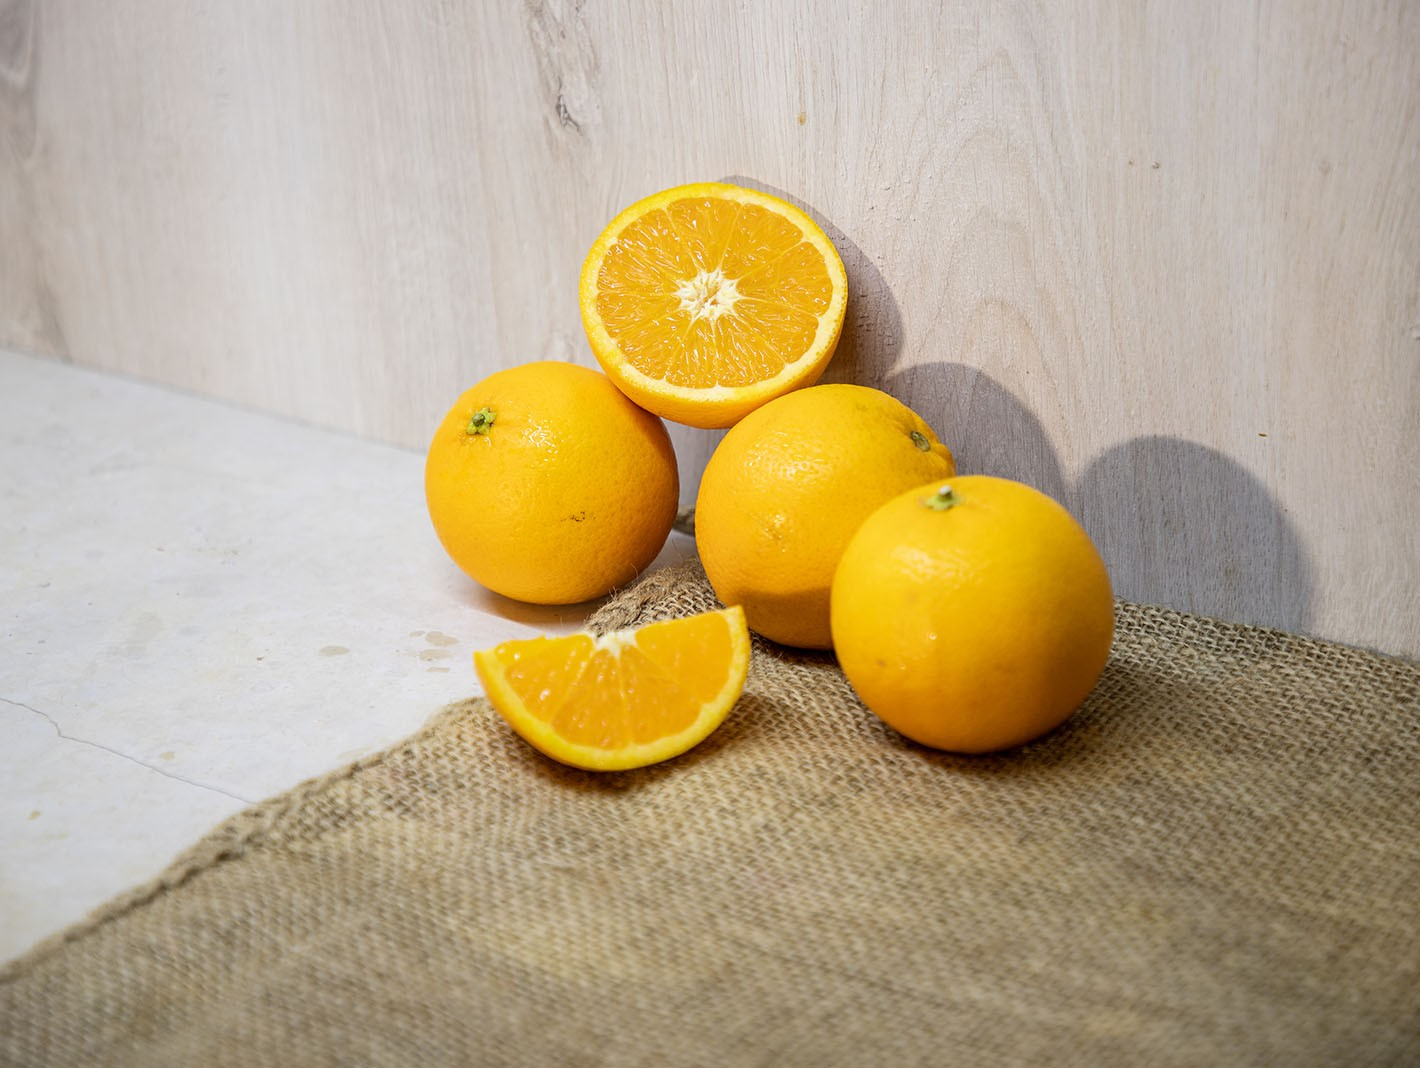 Oranfrutta Arance Valencia da spremuta